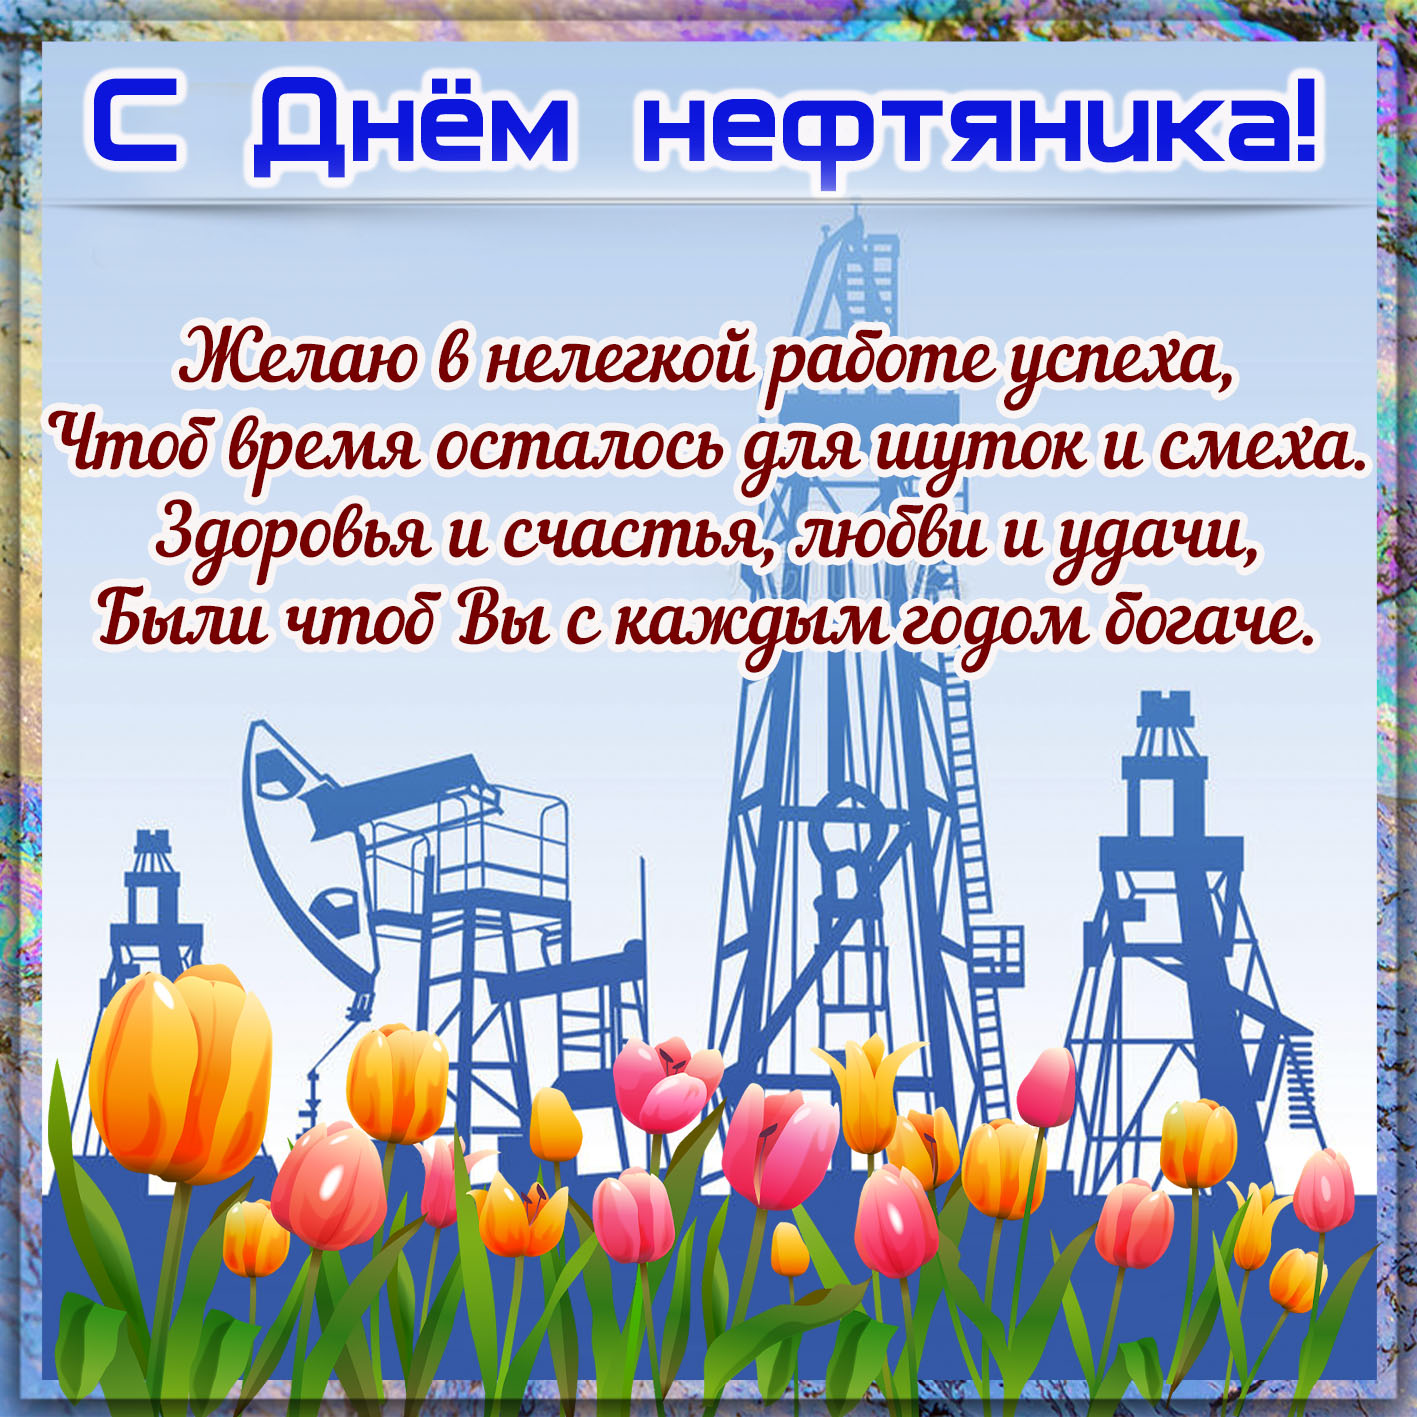 Картинки день нефтяника 2019, для